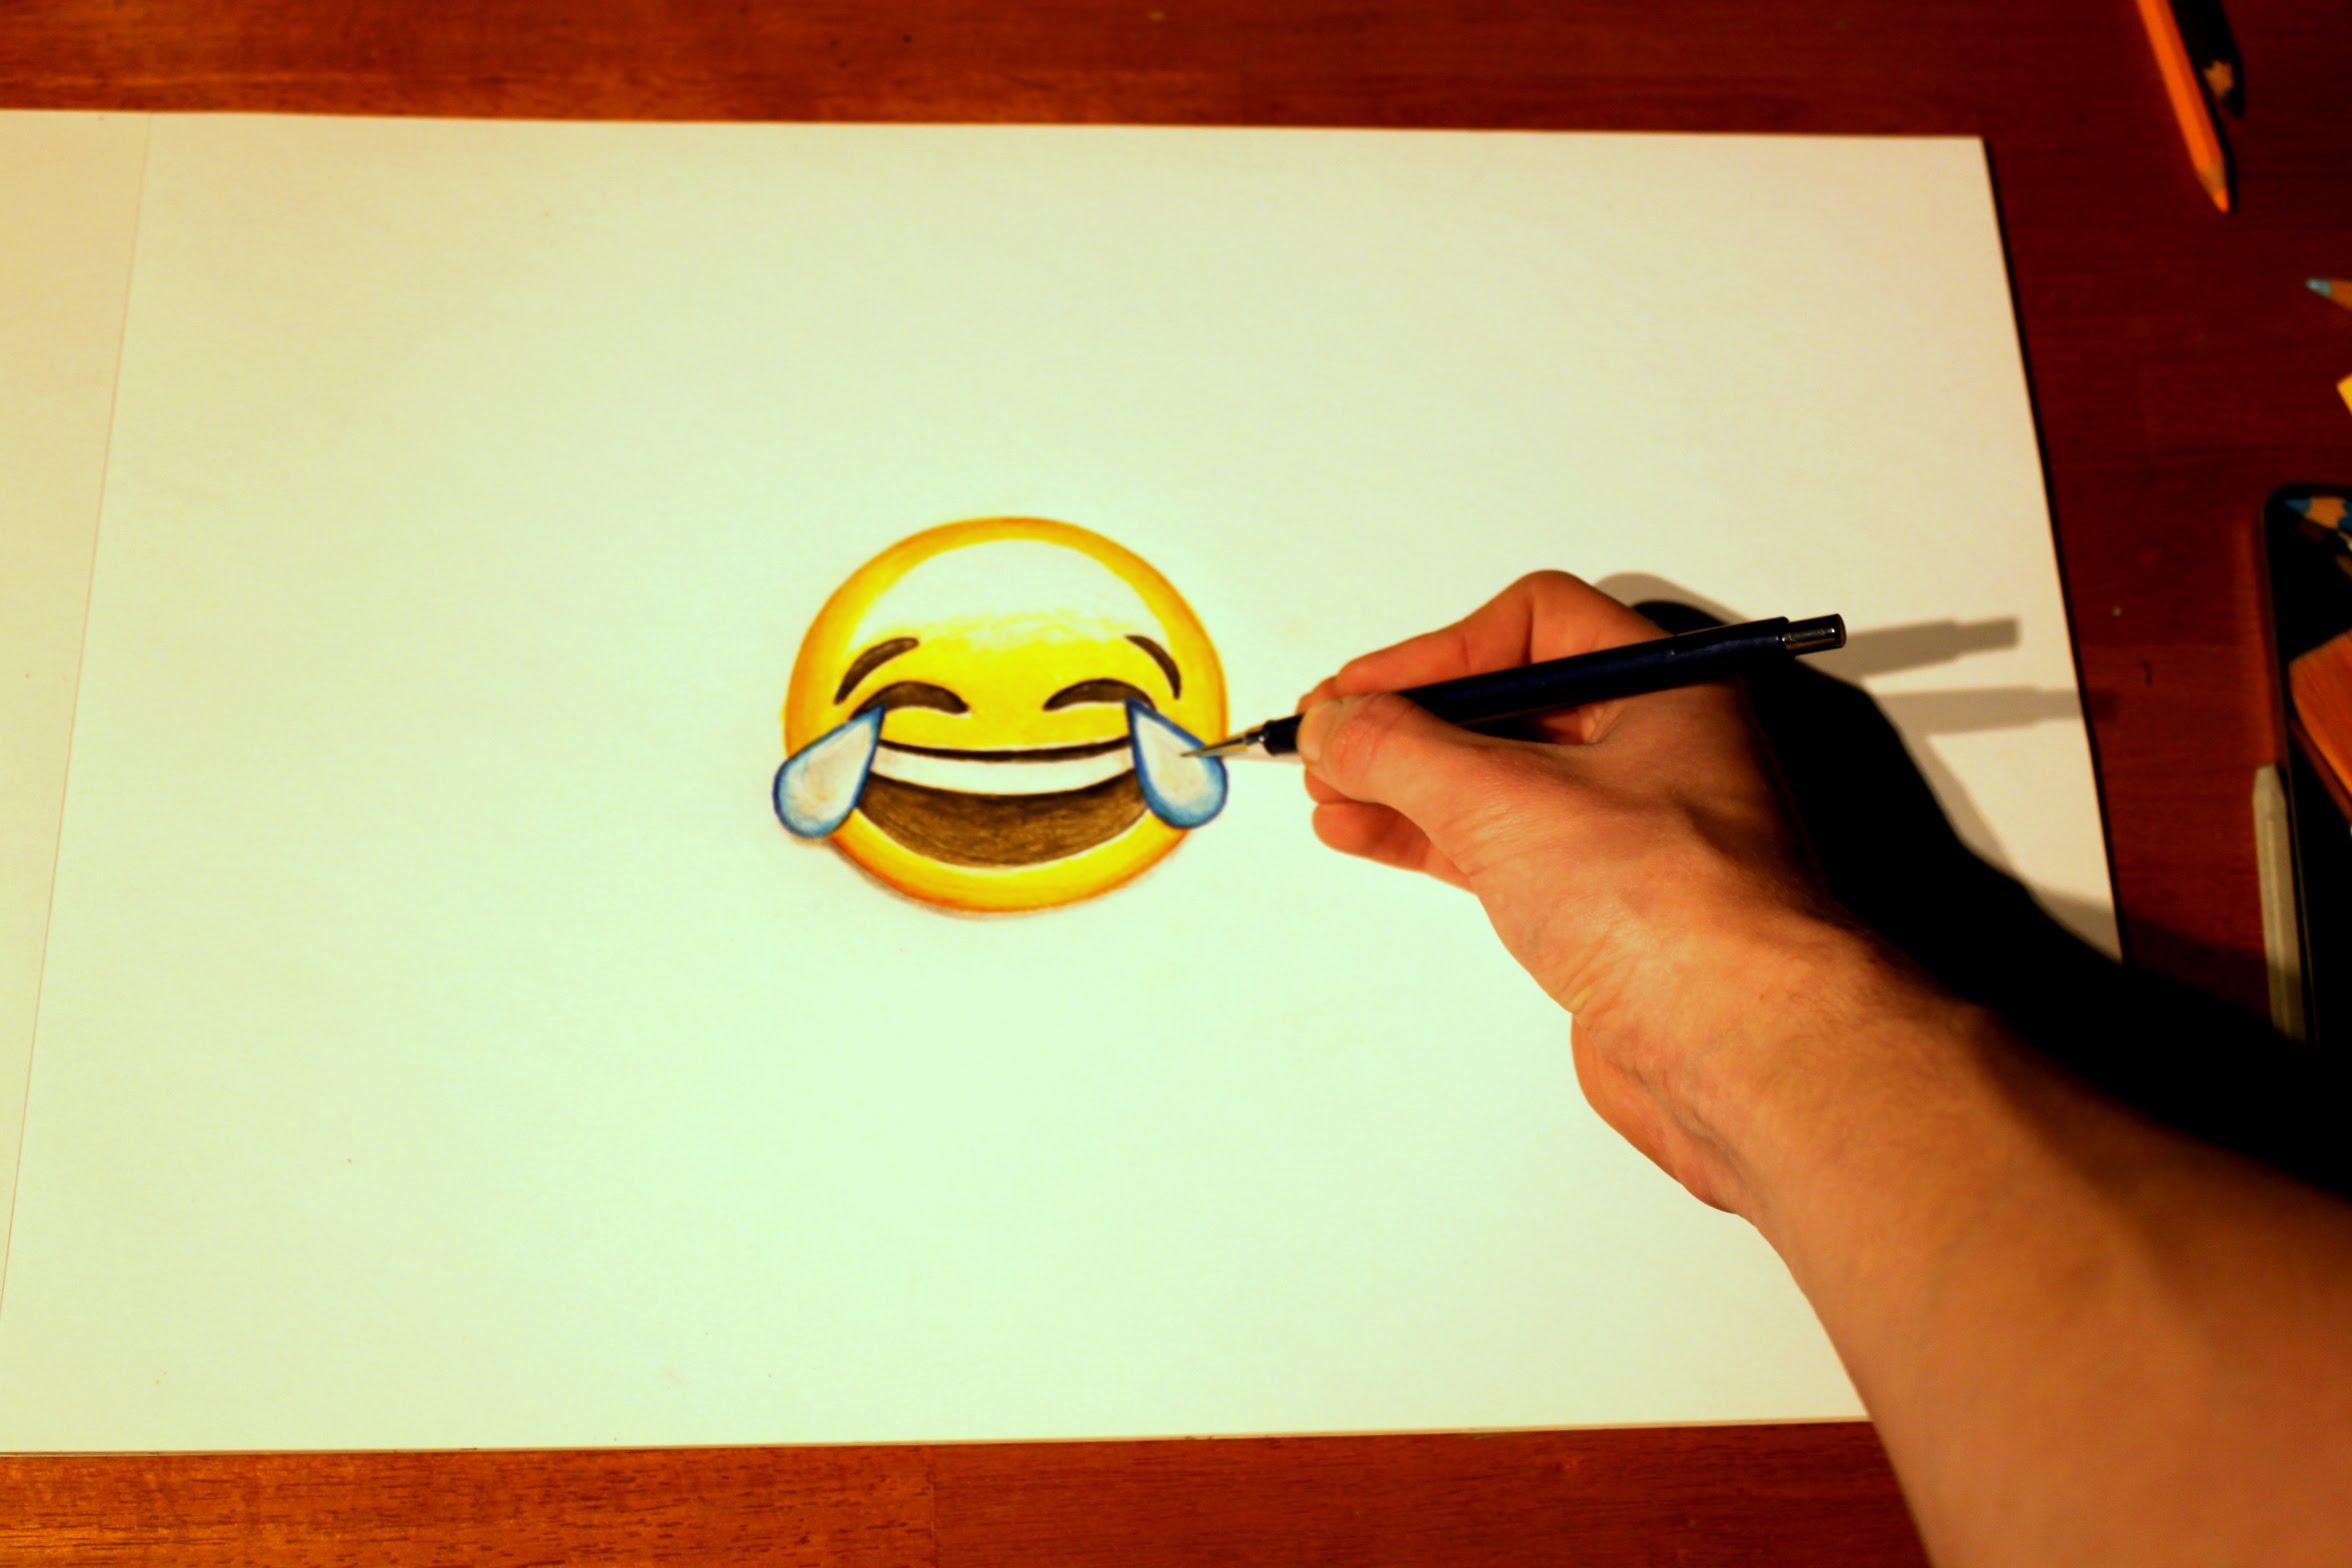 Drawn smile emotion YouTube emoticon to draw Emoji's: